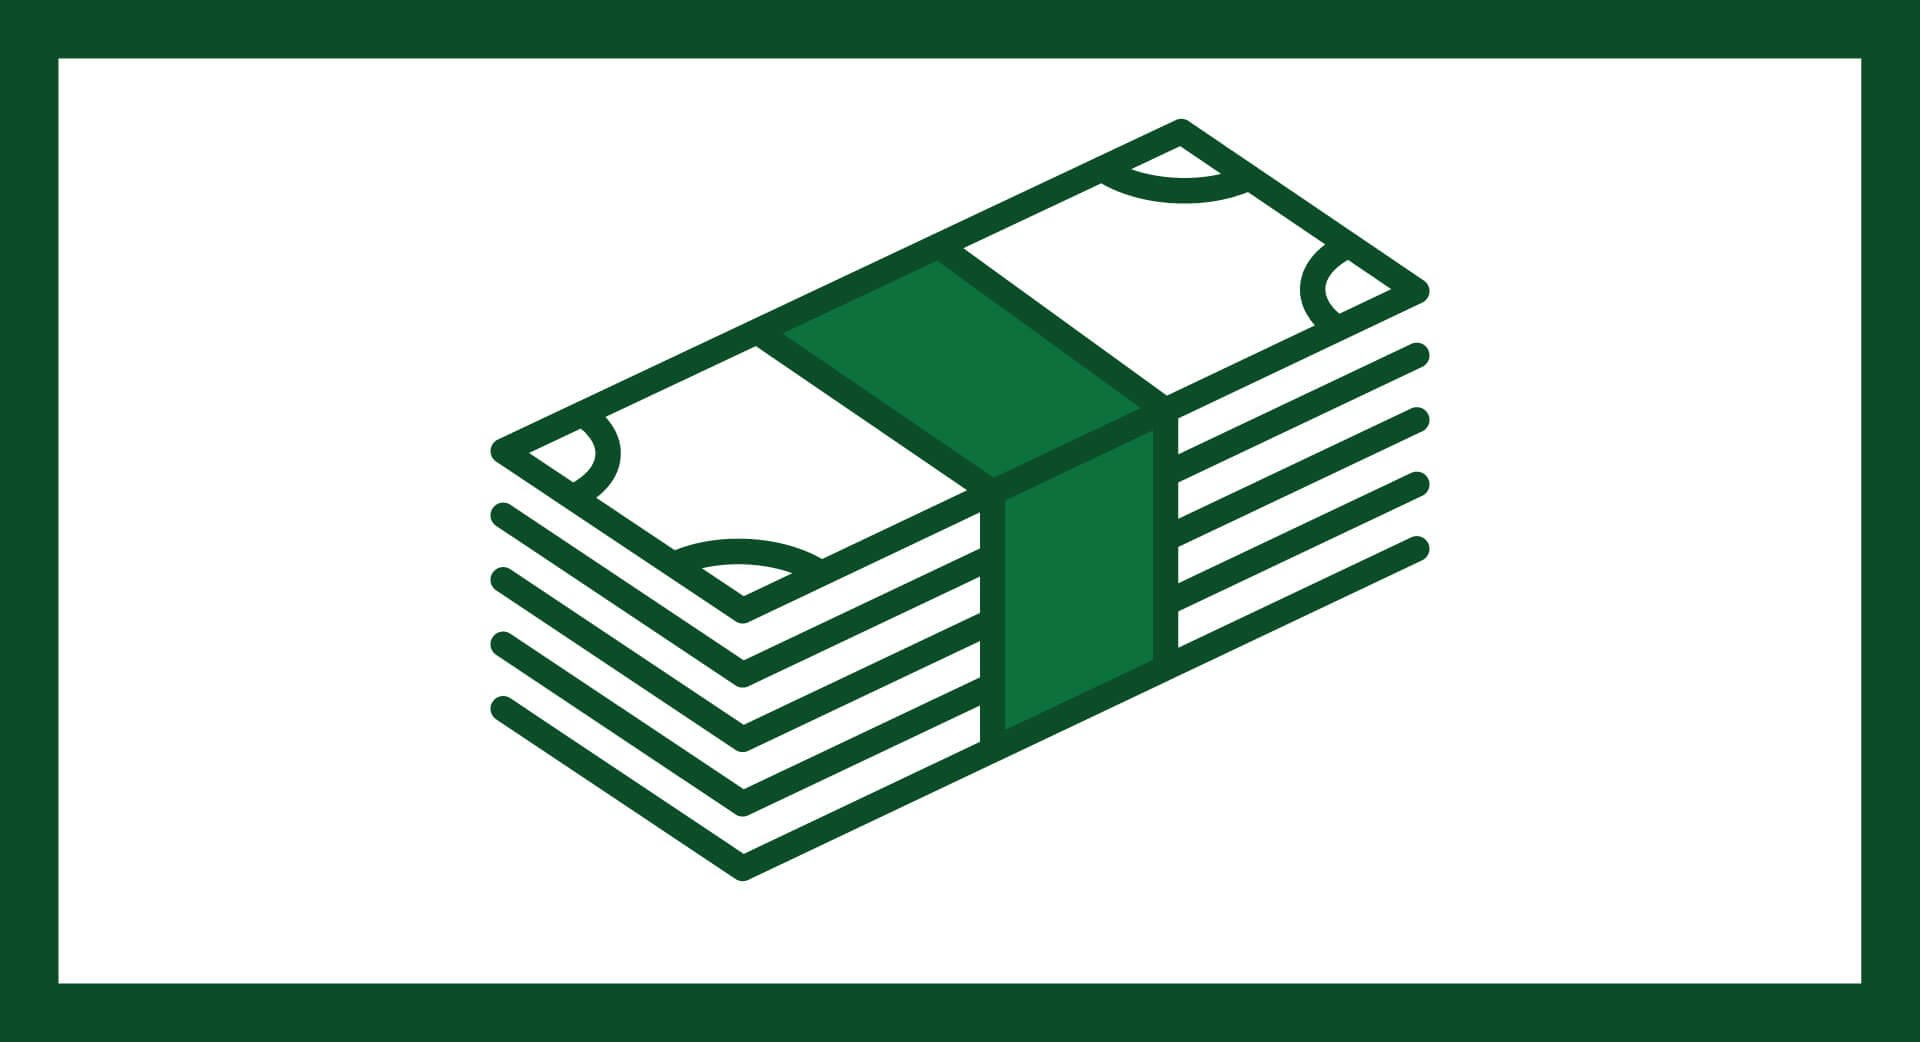 installment loan definition